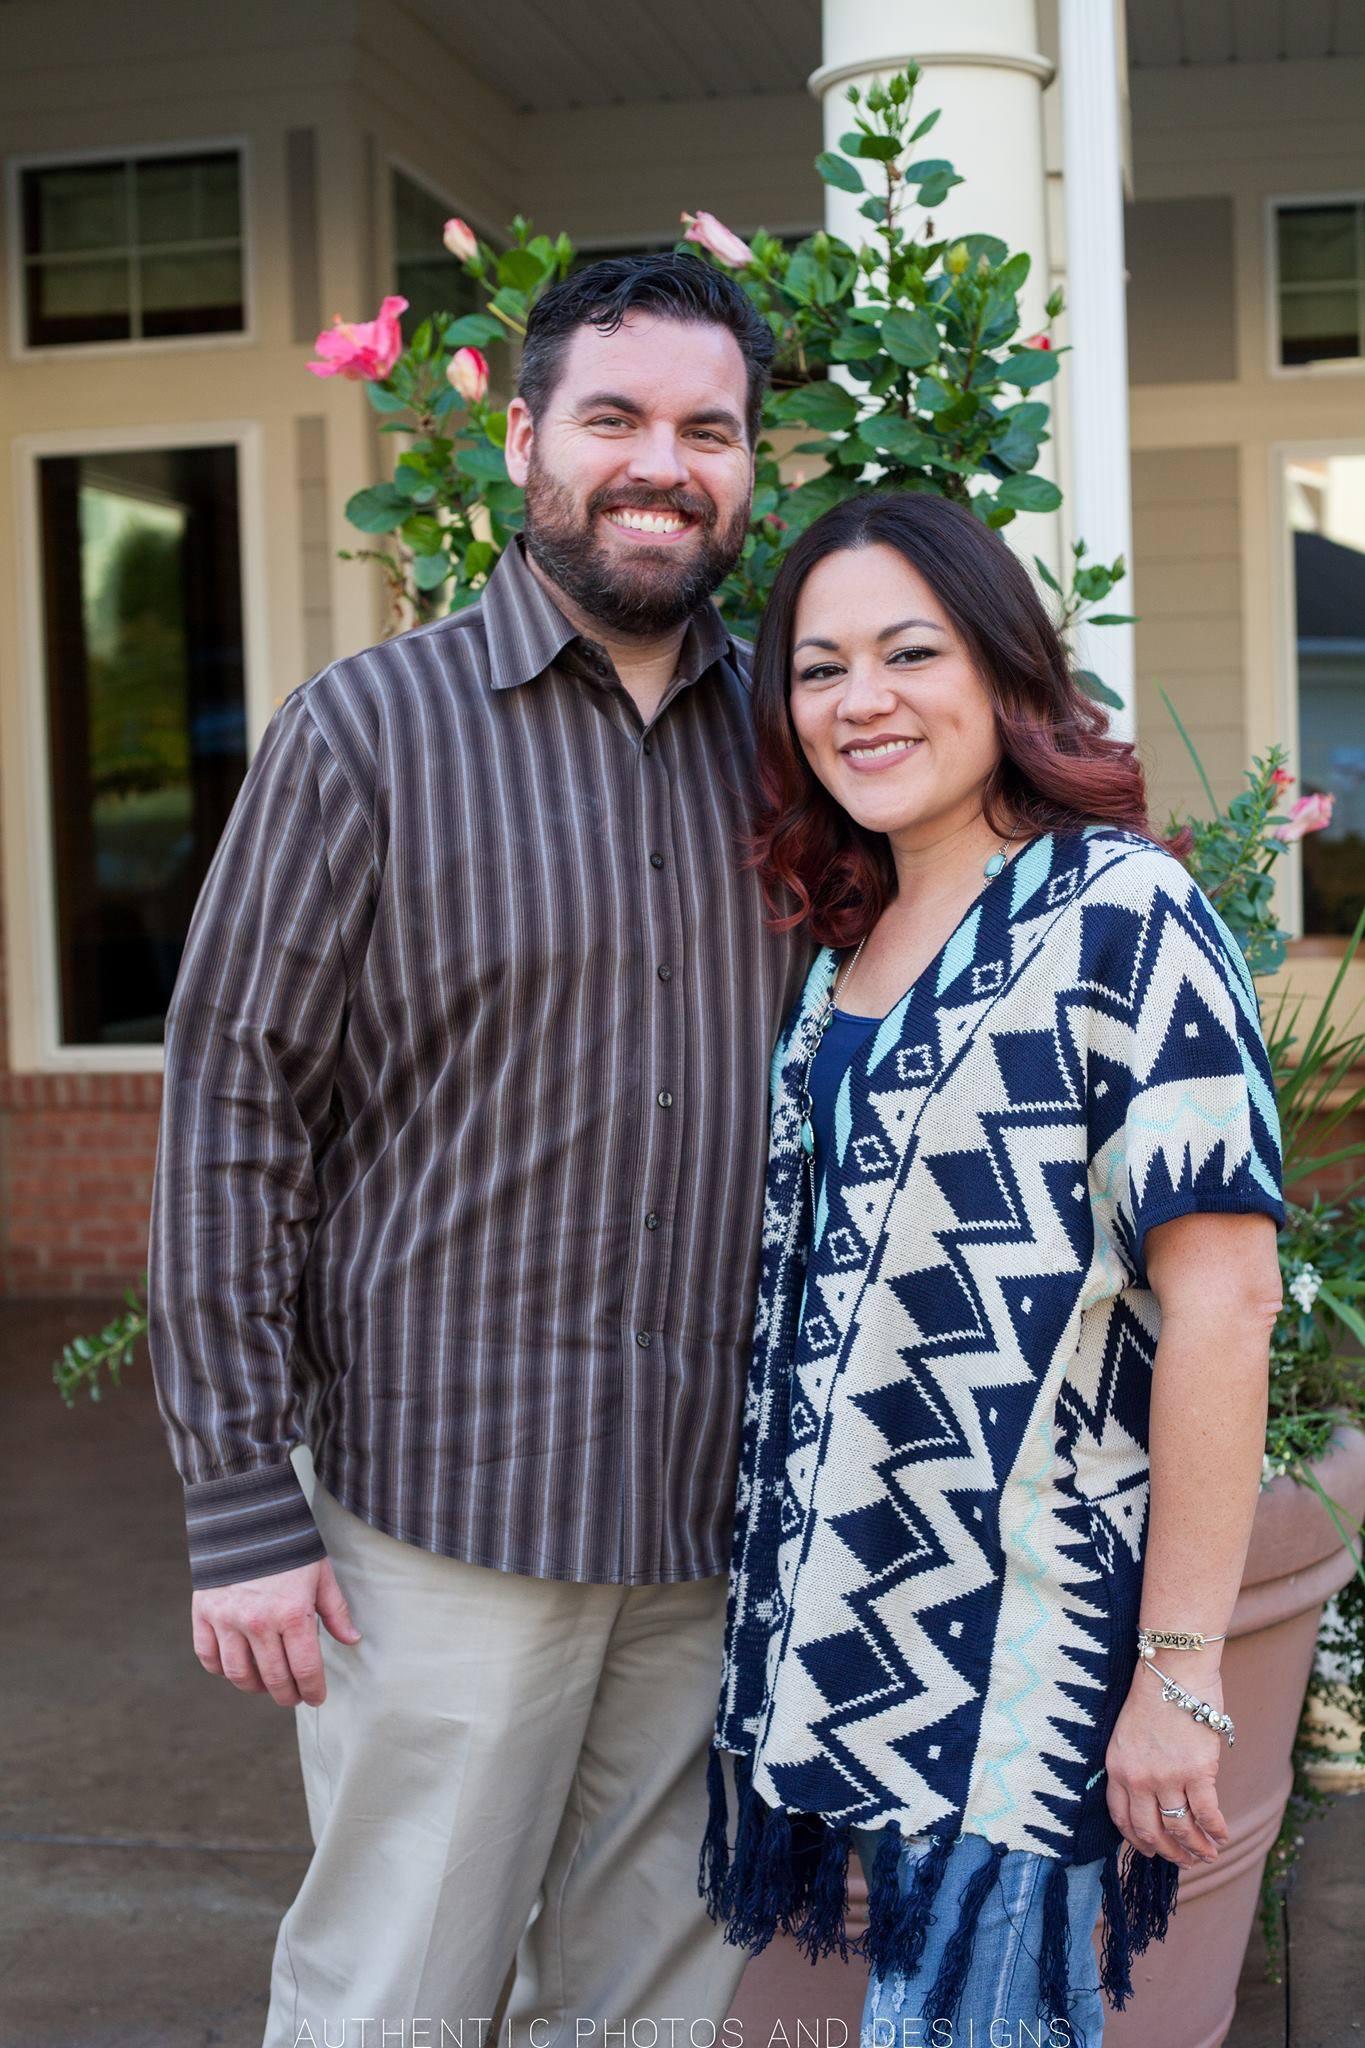 Senior Pastor Chris Wiley and wife Sonya